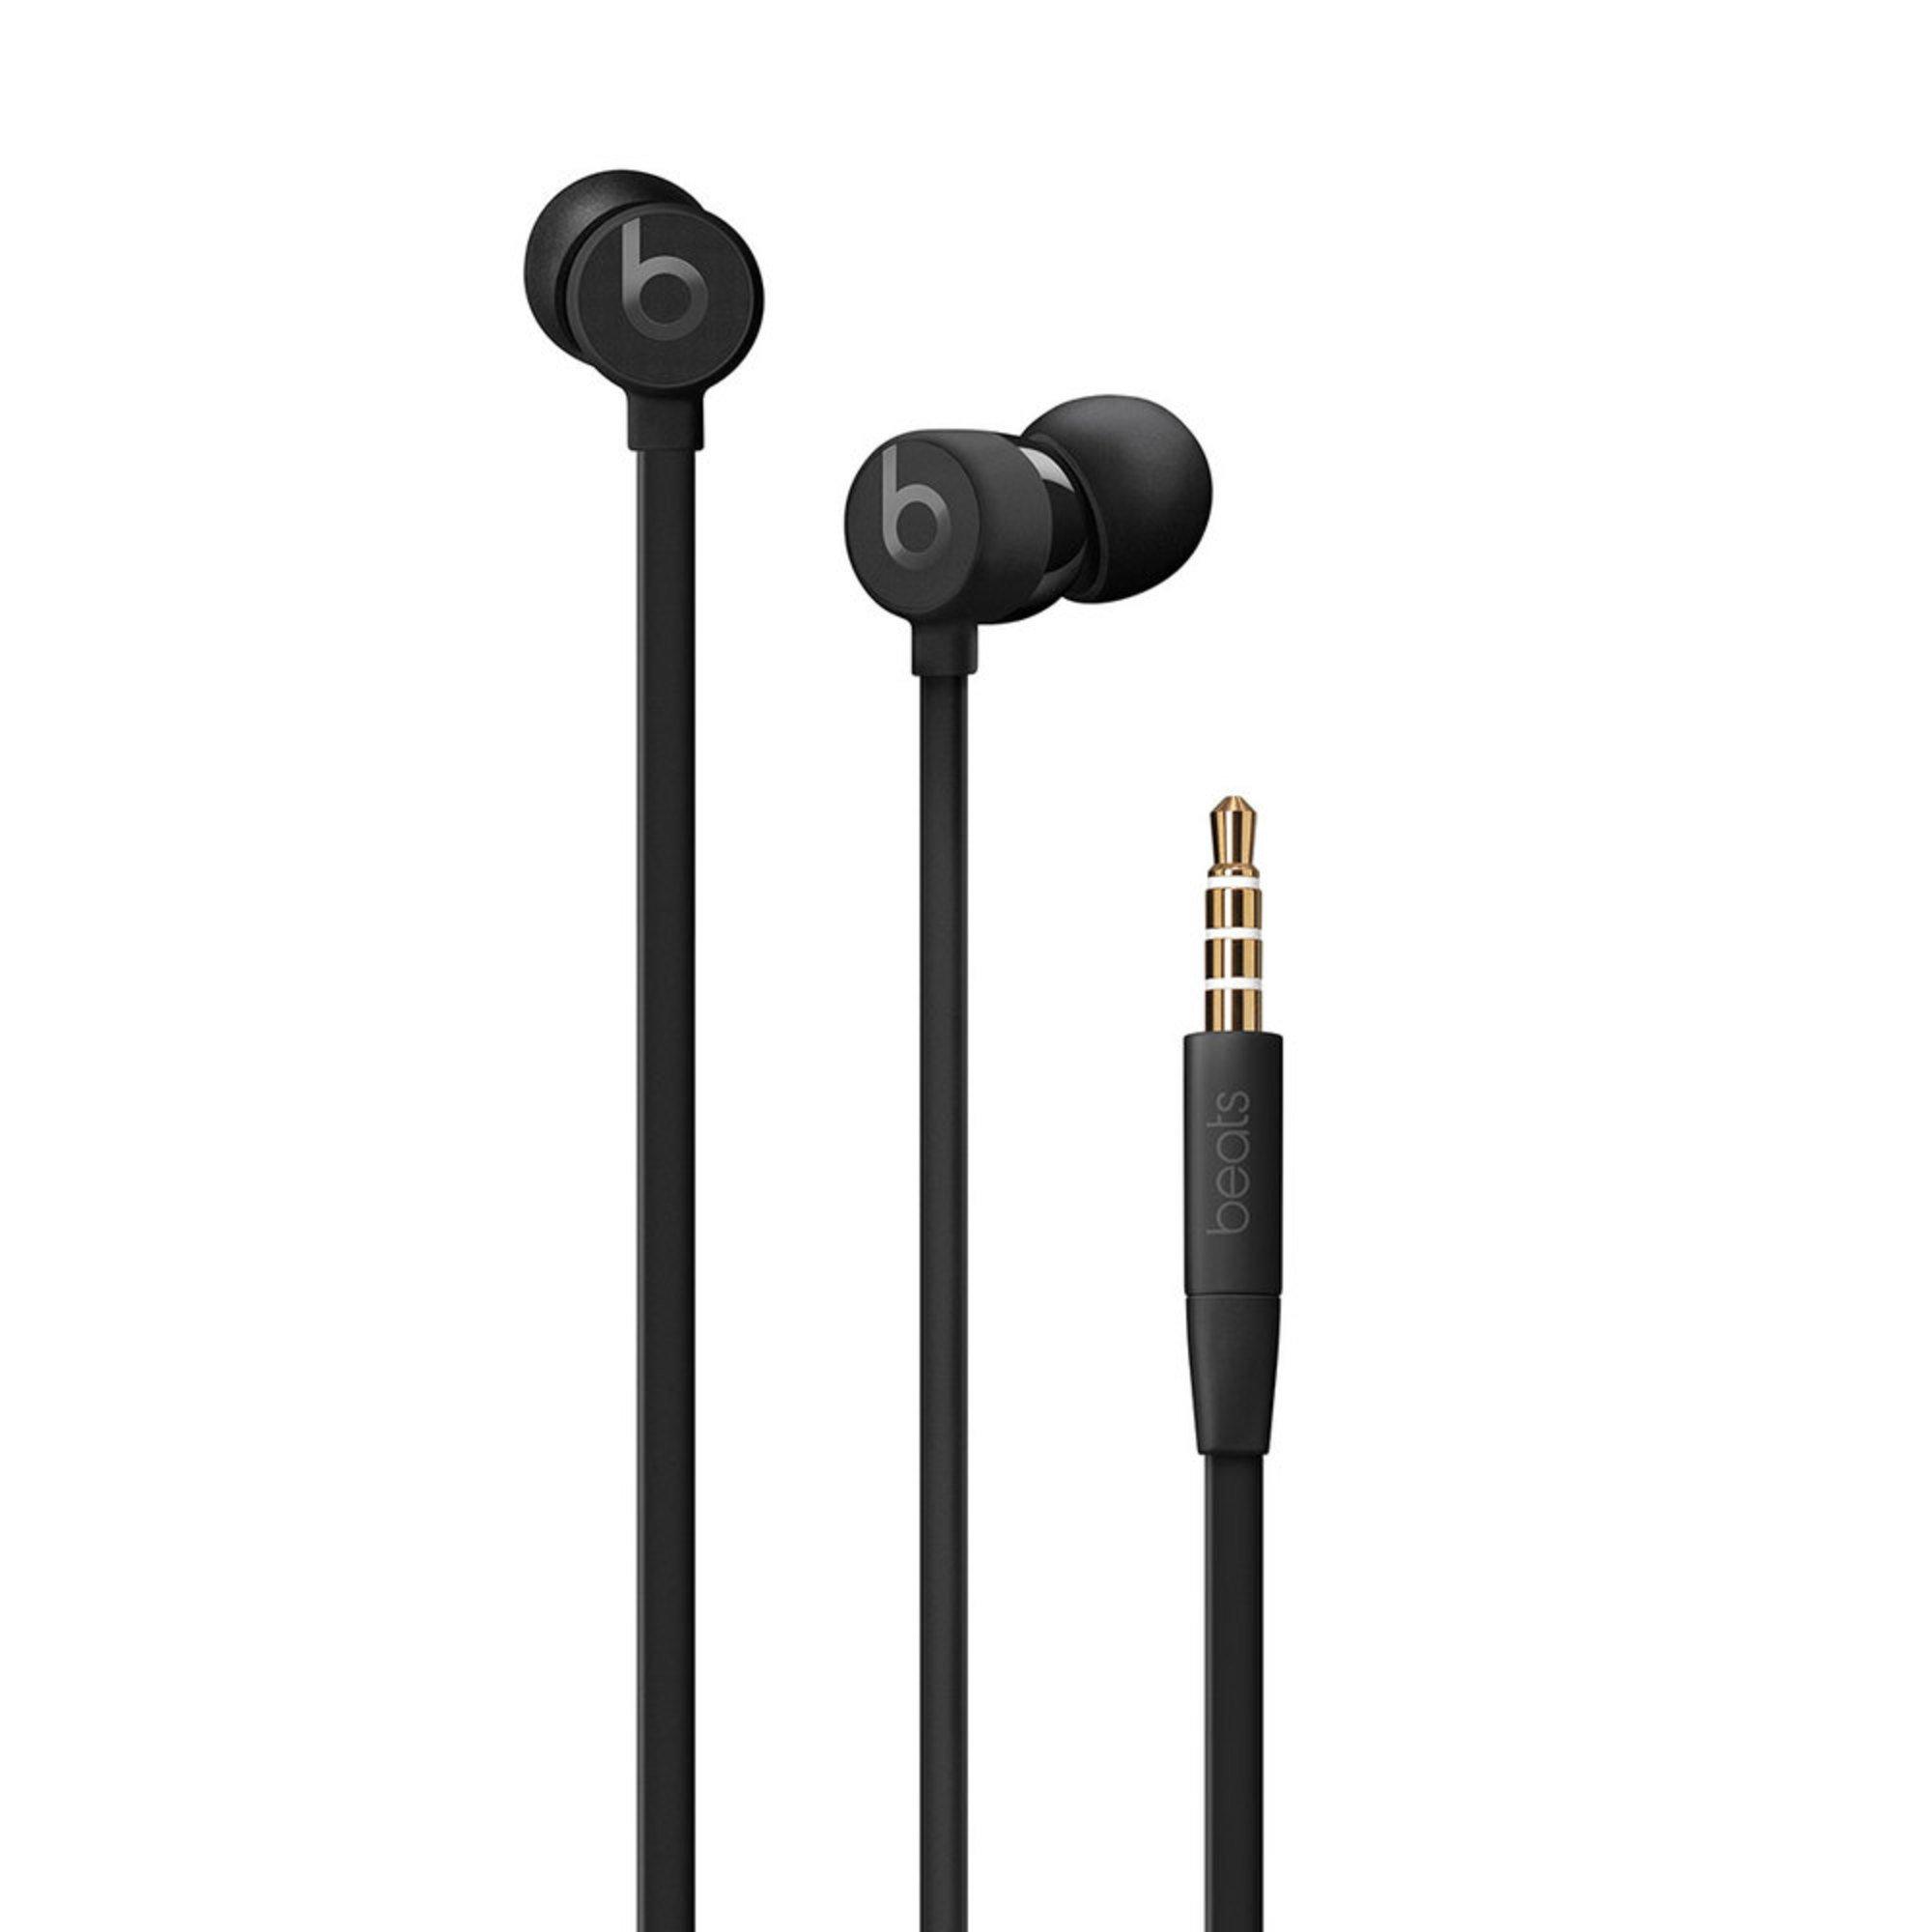 72f03e0c6ee16e Beats Urbeats3 Earphones With 3.5mm Plug   Earbud & In-ear ...